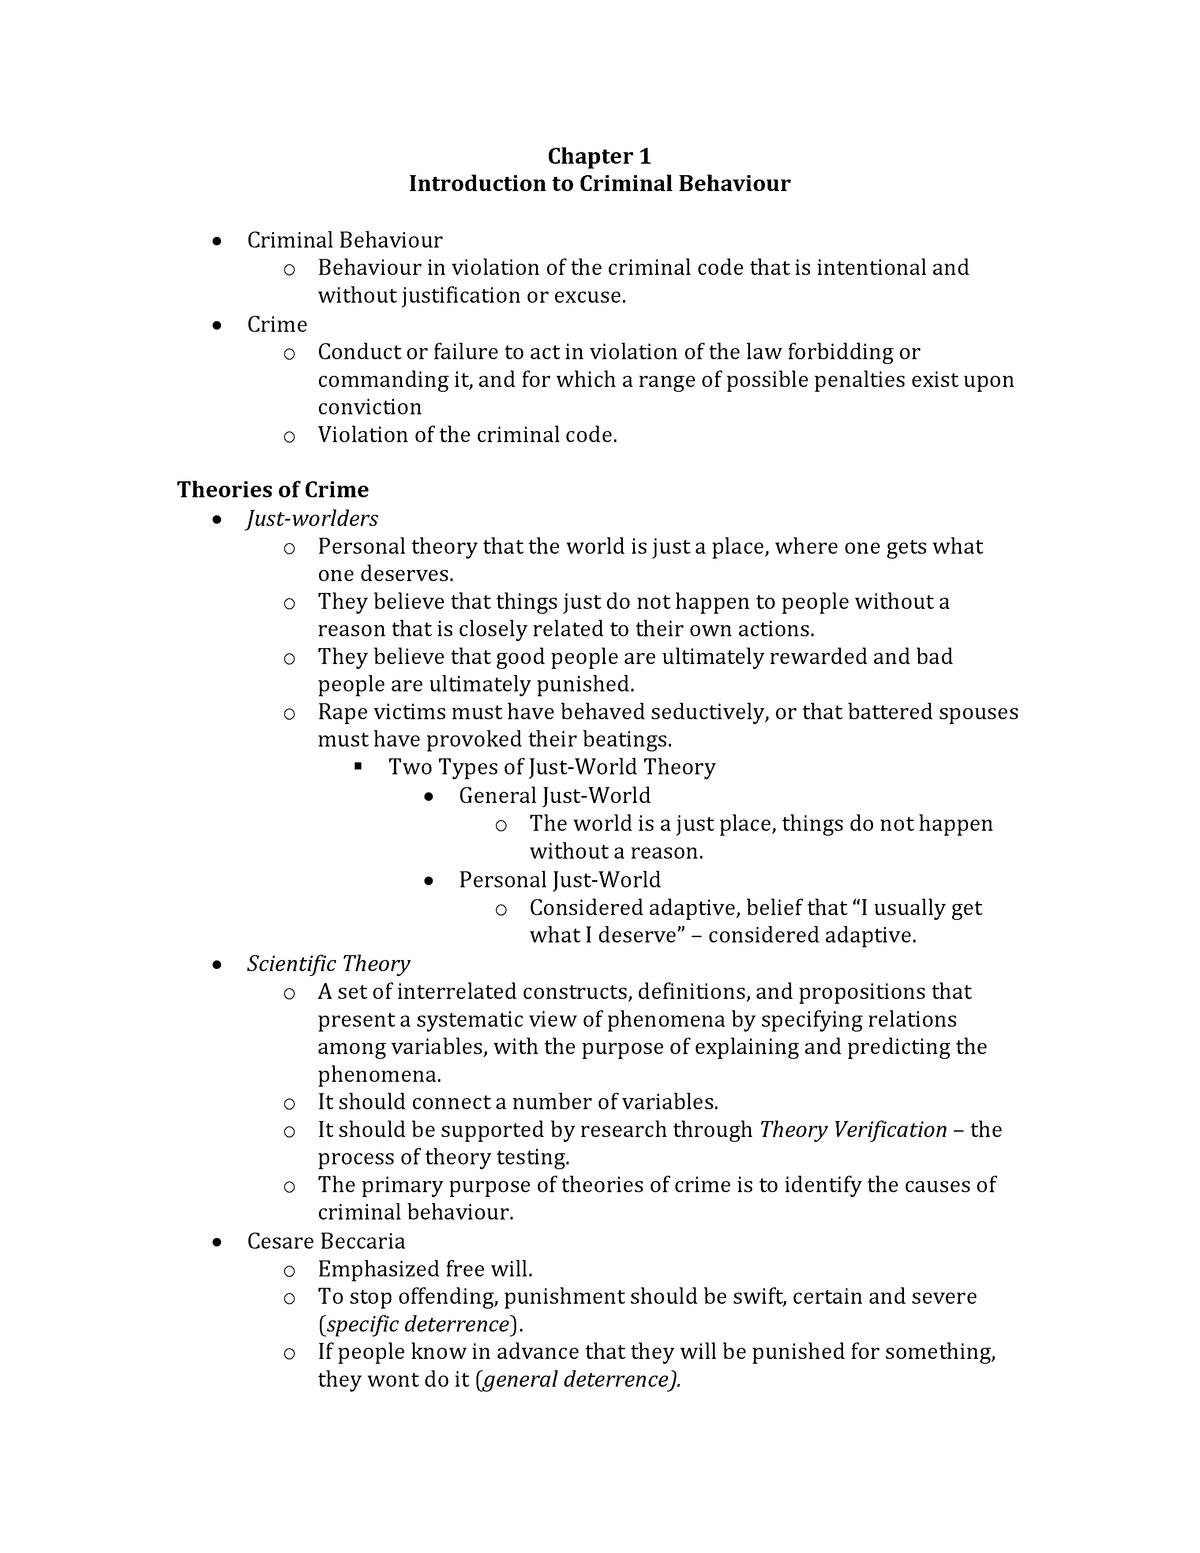 Summary Criminal Behavior: A Psychological Approach